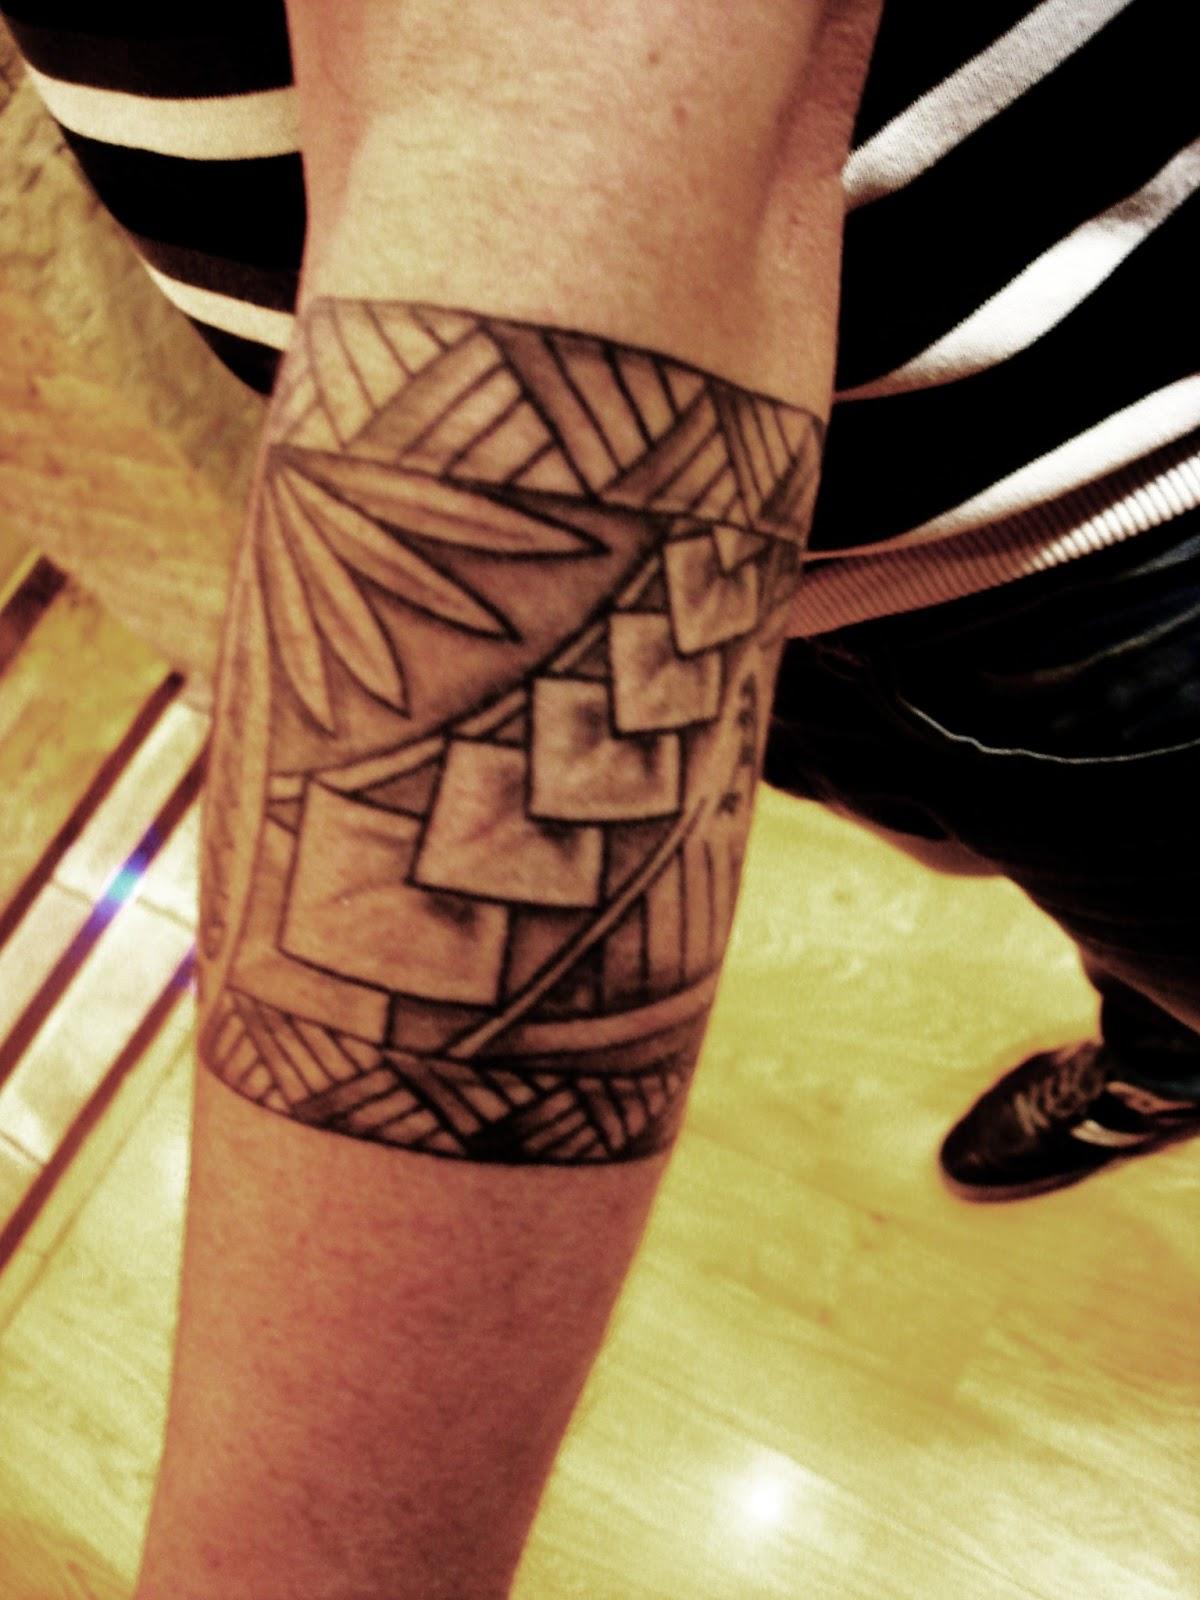 Tatoos Brazaletes Brazalete Polinesio With Tatoos Brazaletes Cool - Tattoo-brazaletes